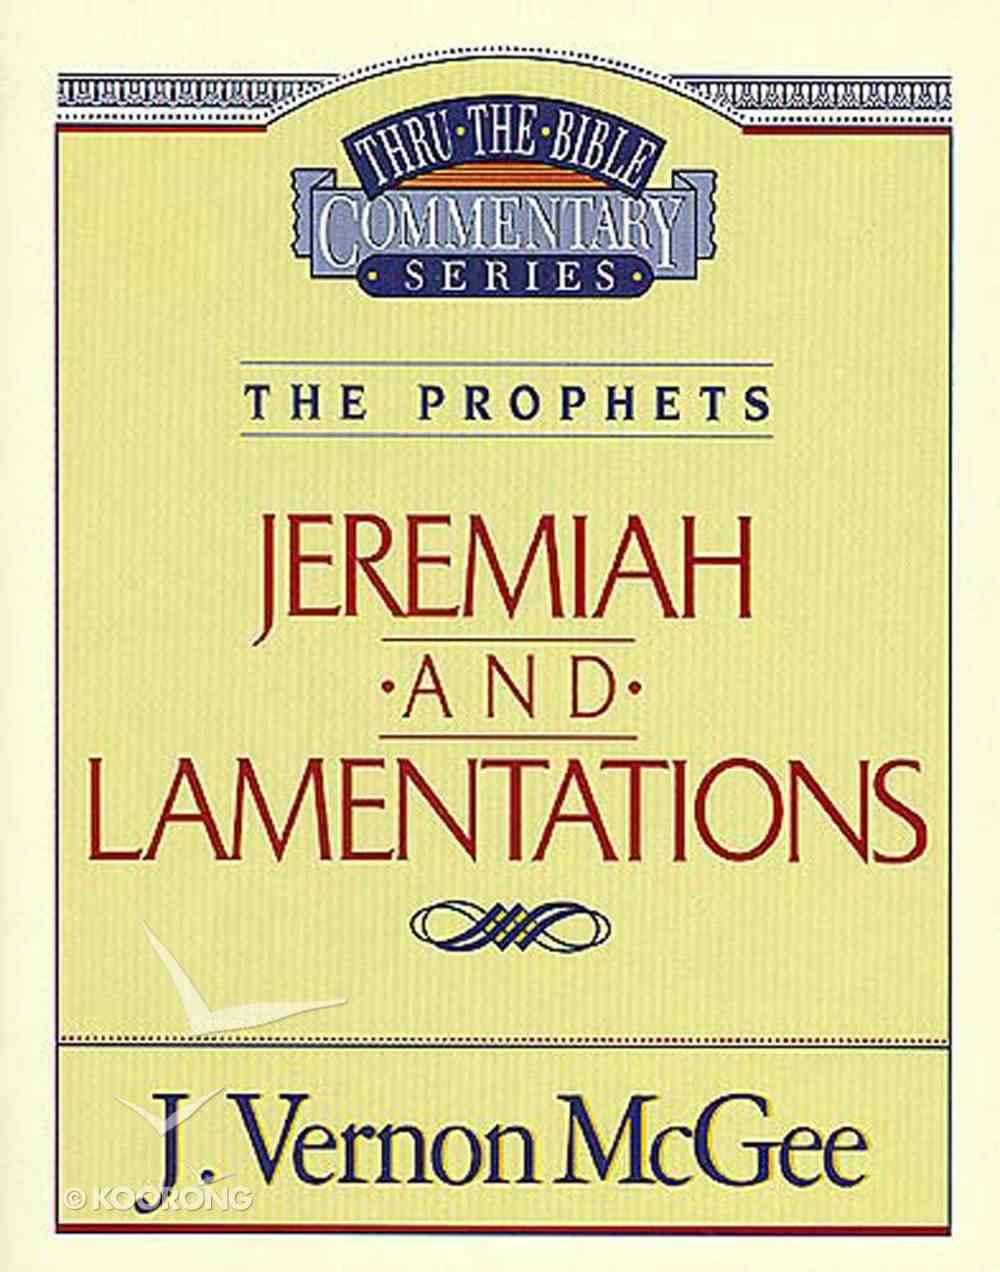 Thru the Bible OT #24: Jeremiah/Lamentations (#24 in Thru The Bible Old Testament Series) eBook